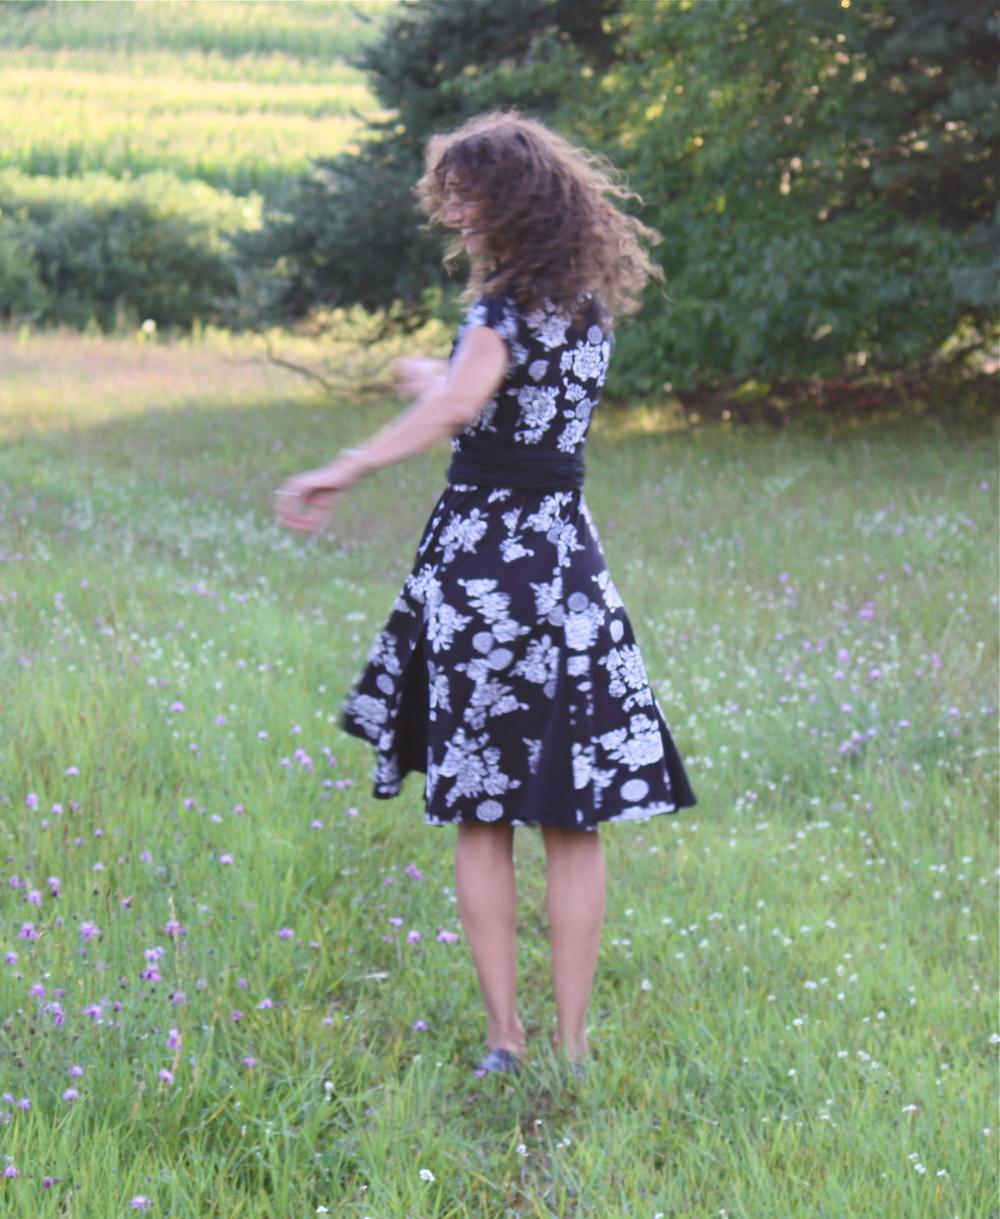 No, I do not think I am too old to twirl in a field of wildflowers.